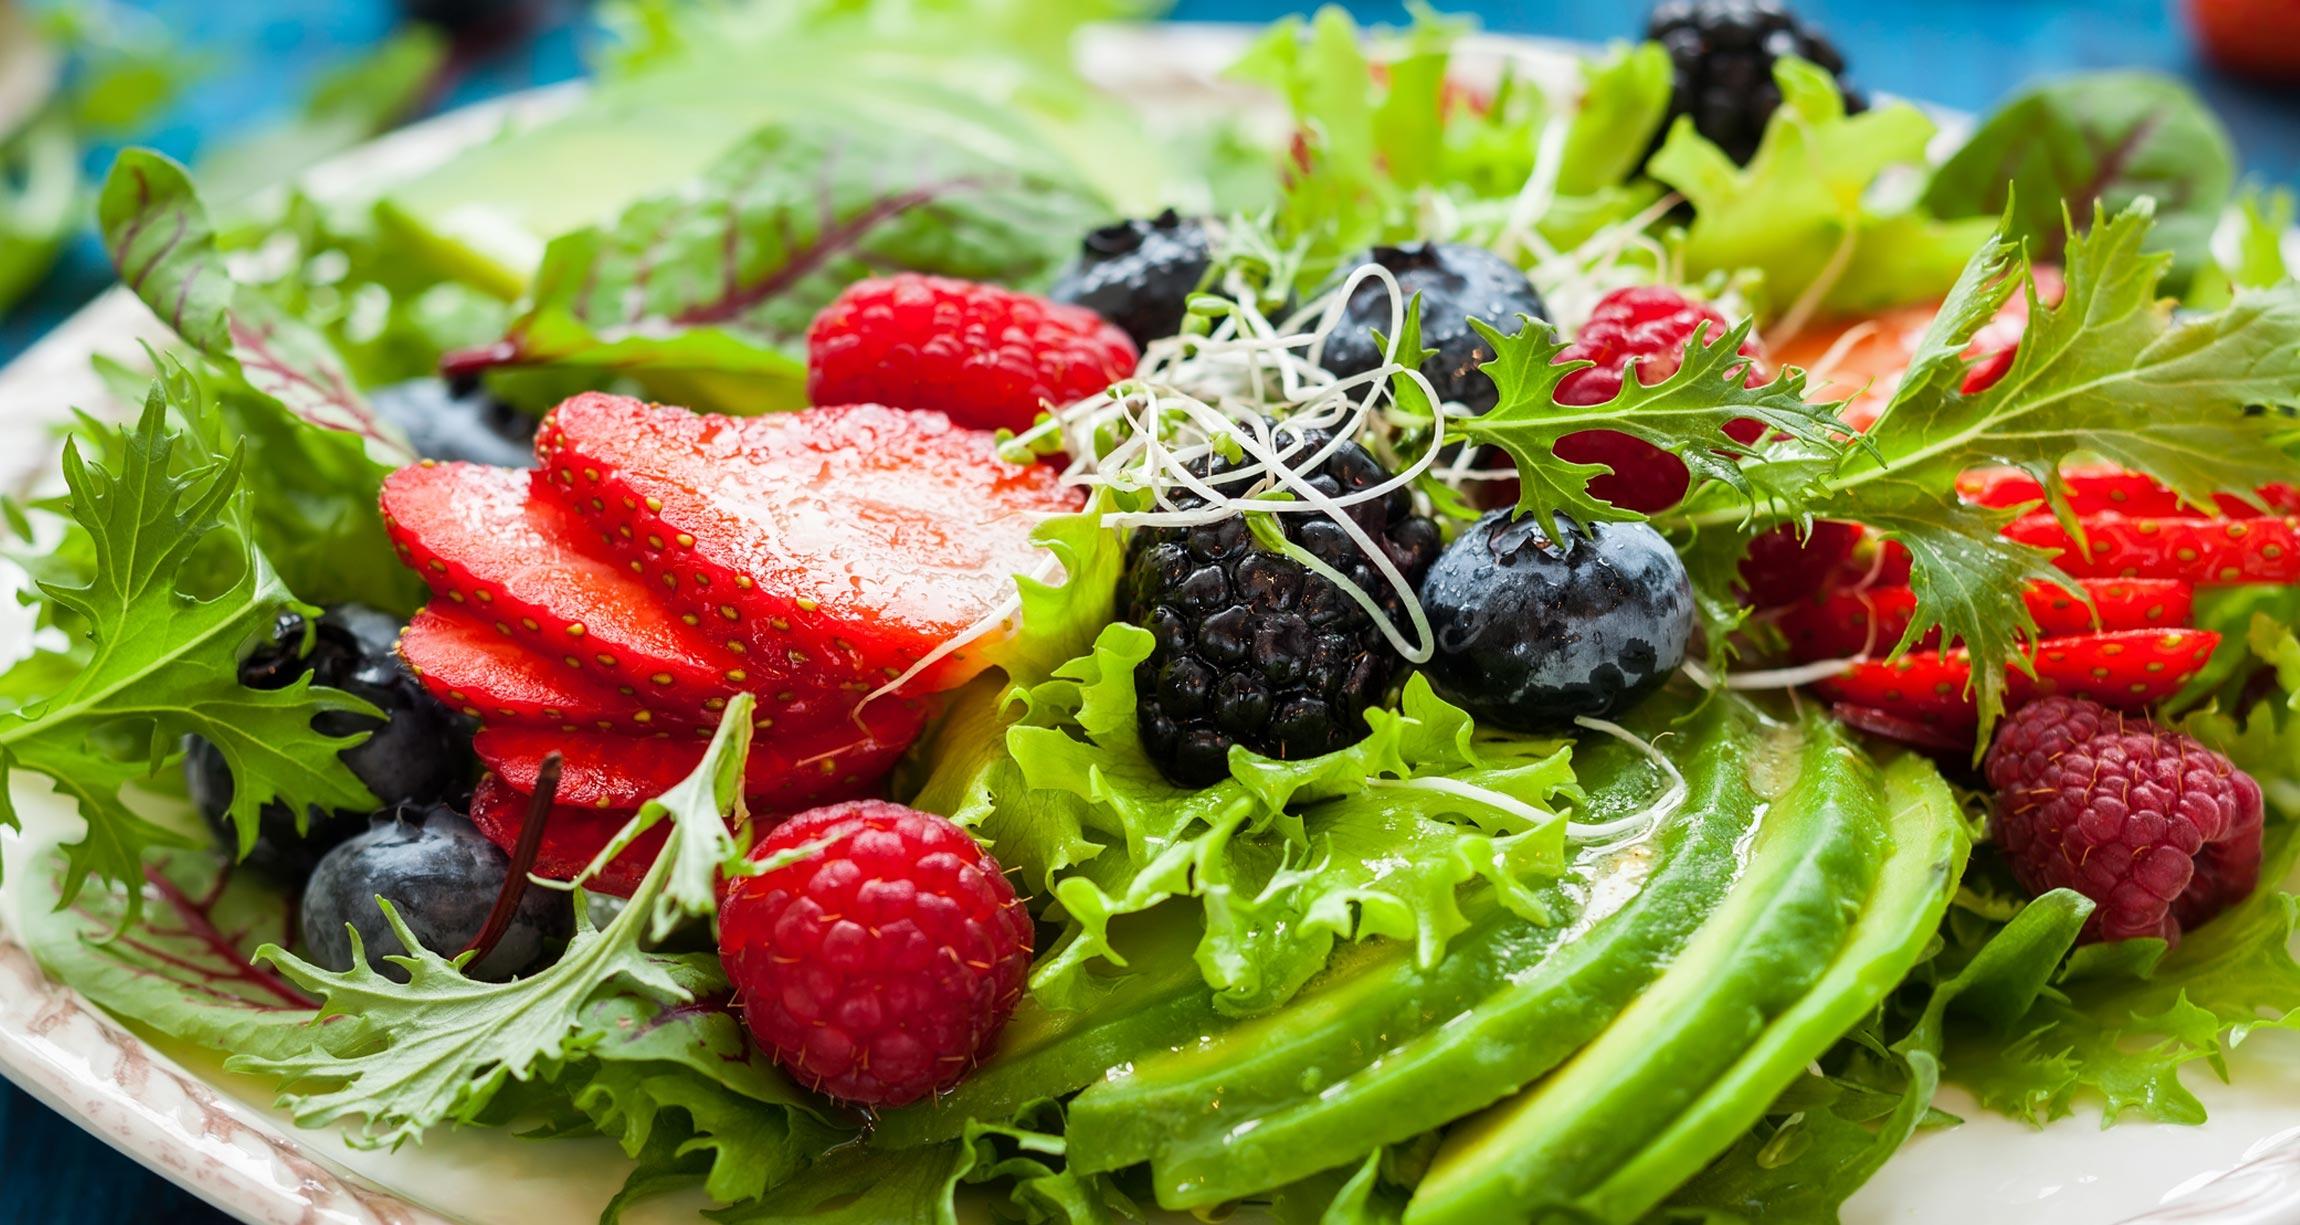 salad with strawberries, blueberries, and blackberries